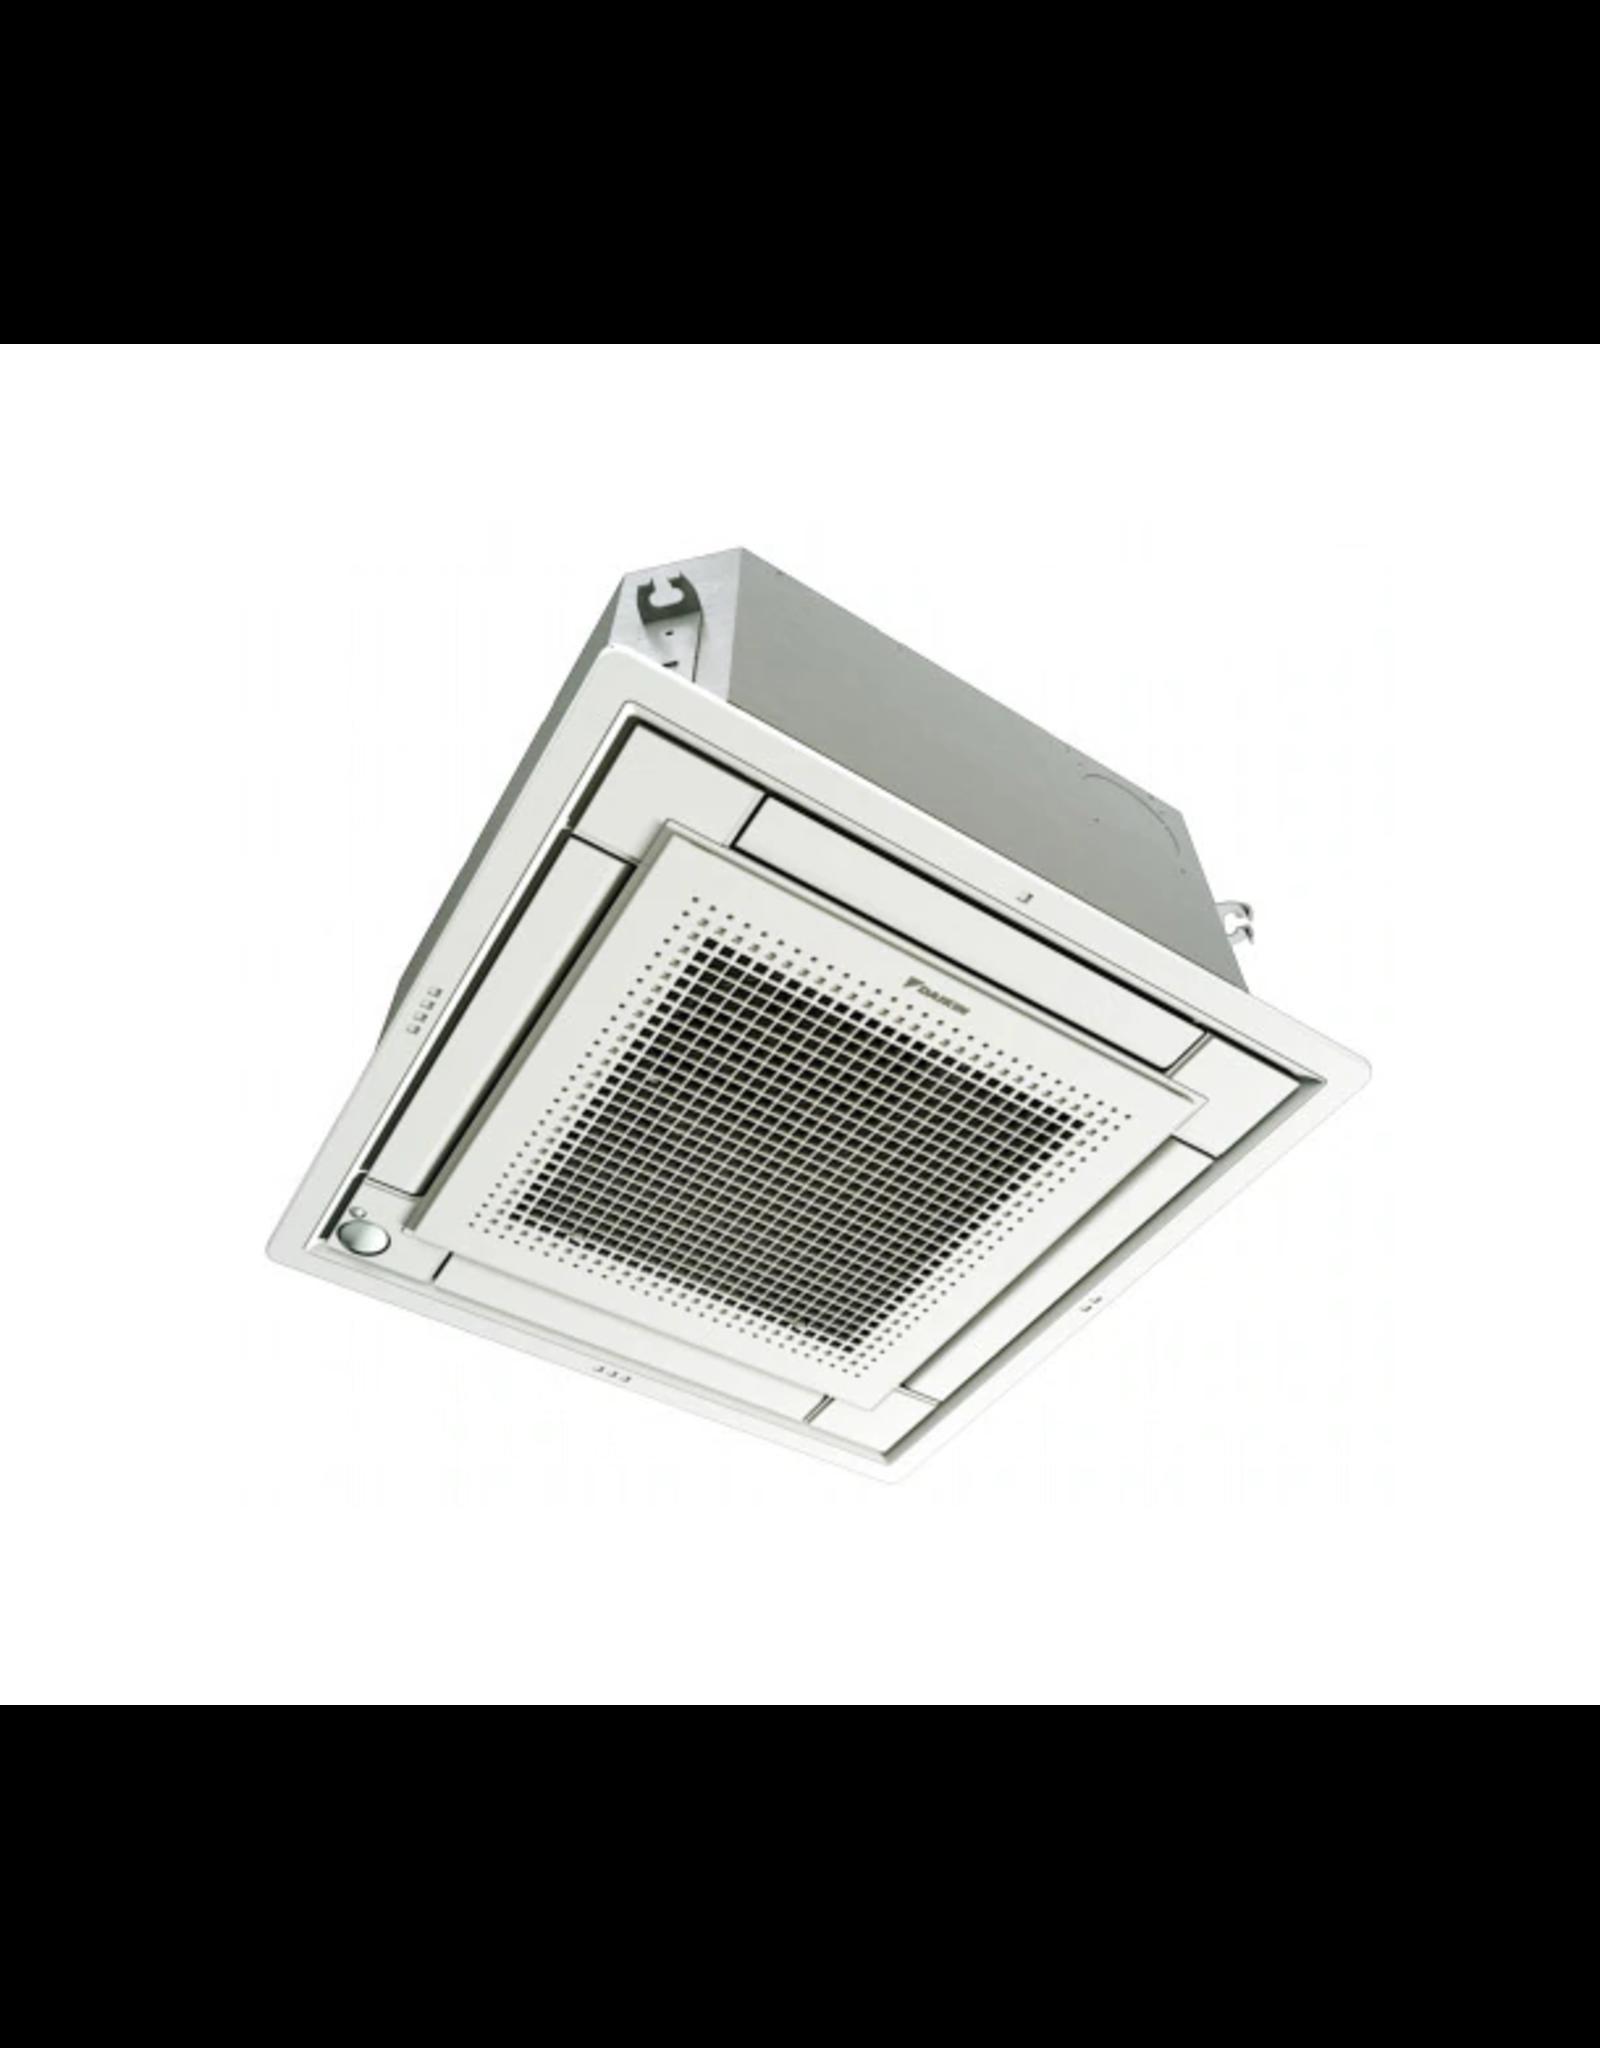 Daikin Applied Americas VISTA Heat-Pump Single Zone Ceiling Cassette AHU - 208/230v - 1ph